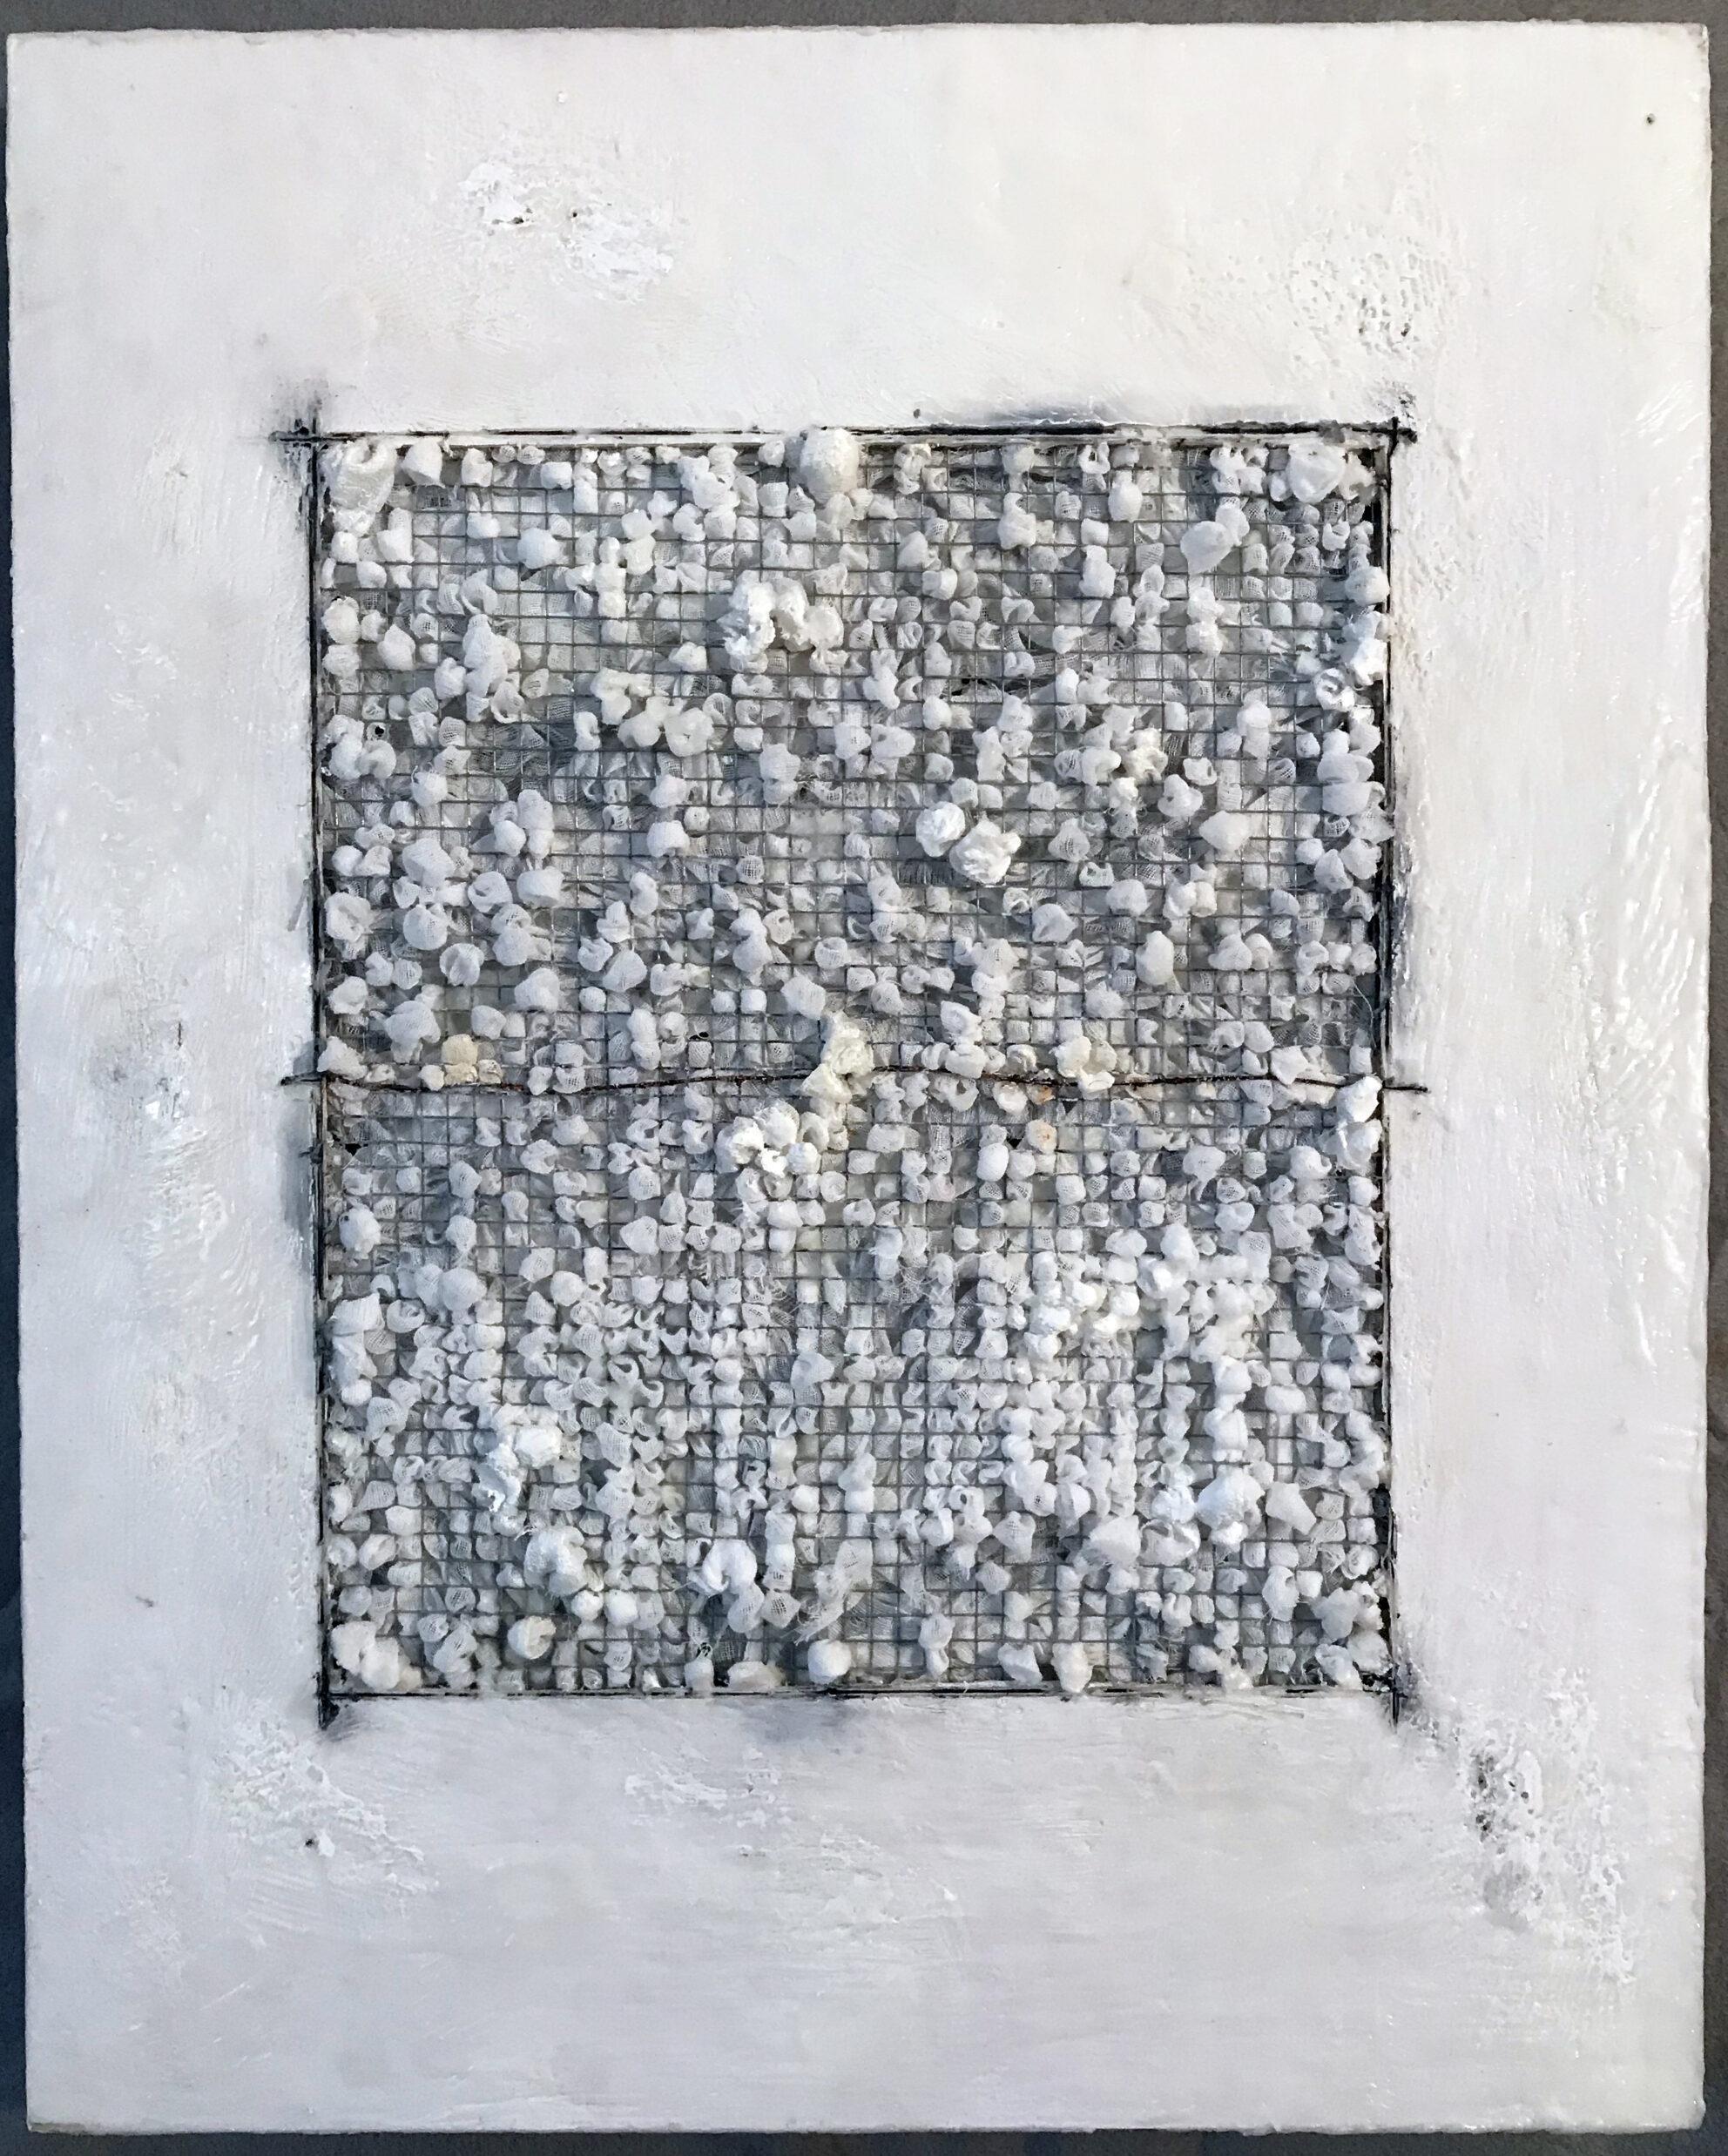 """Grid with One Line"" by Megan Klim, gauze, wire, encaustic, pencil, wood, 20x16"